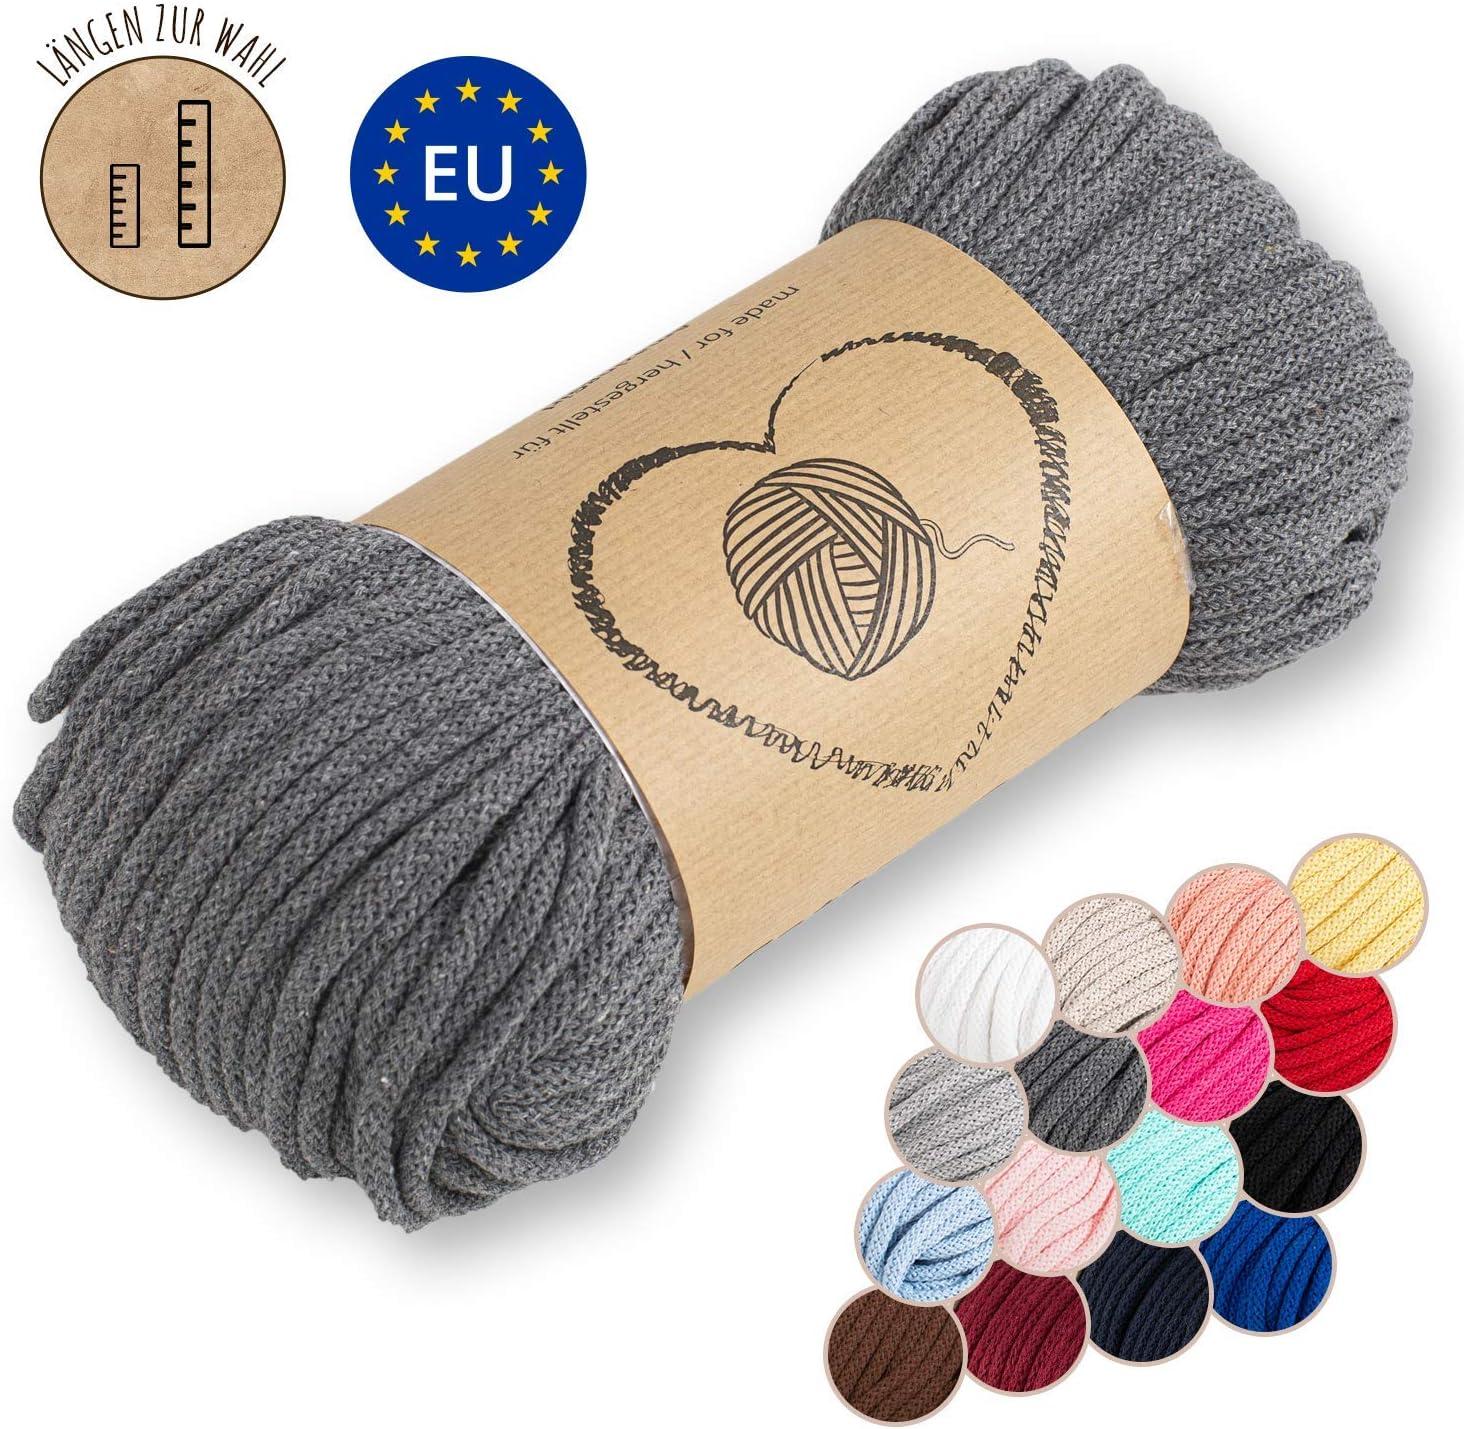 Amazinggirl Hilo Macrame 5 mm trapillo bobinas - Cuerda Algodon Cordon para Trenzado Tejer a Crochet Manualidades Gris